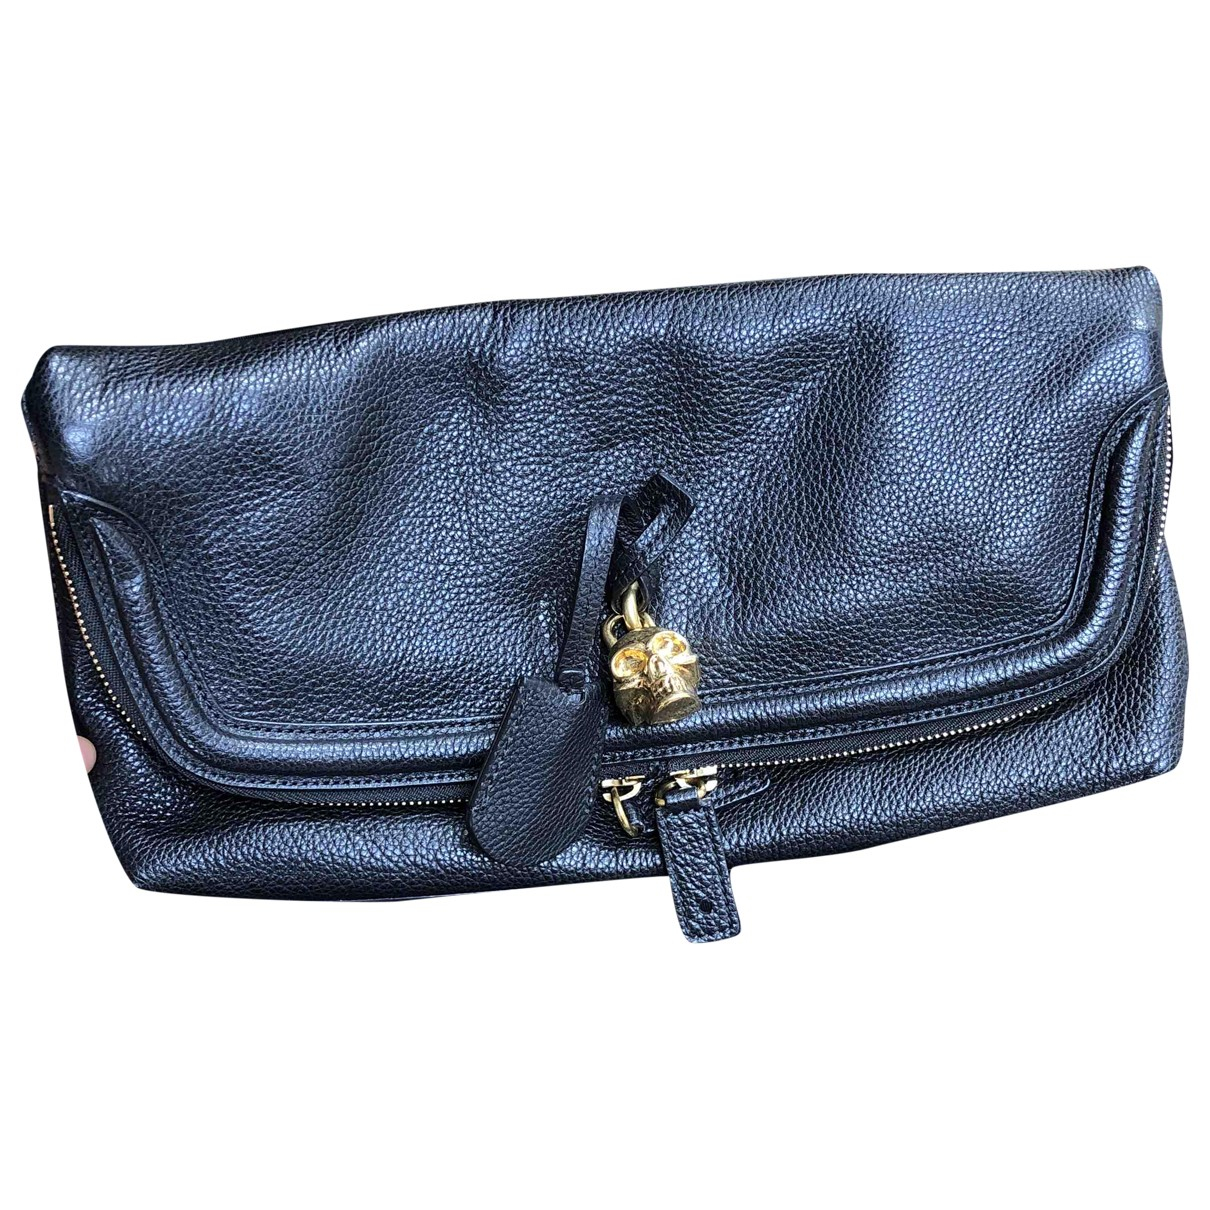 Alexander Mcqueen \N Black Leather Clutch bag for Women \N